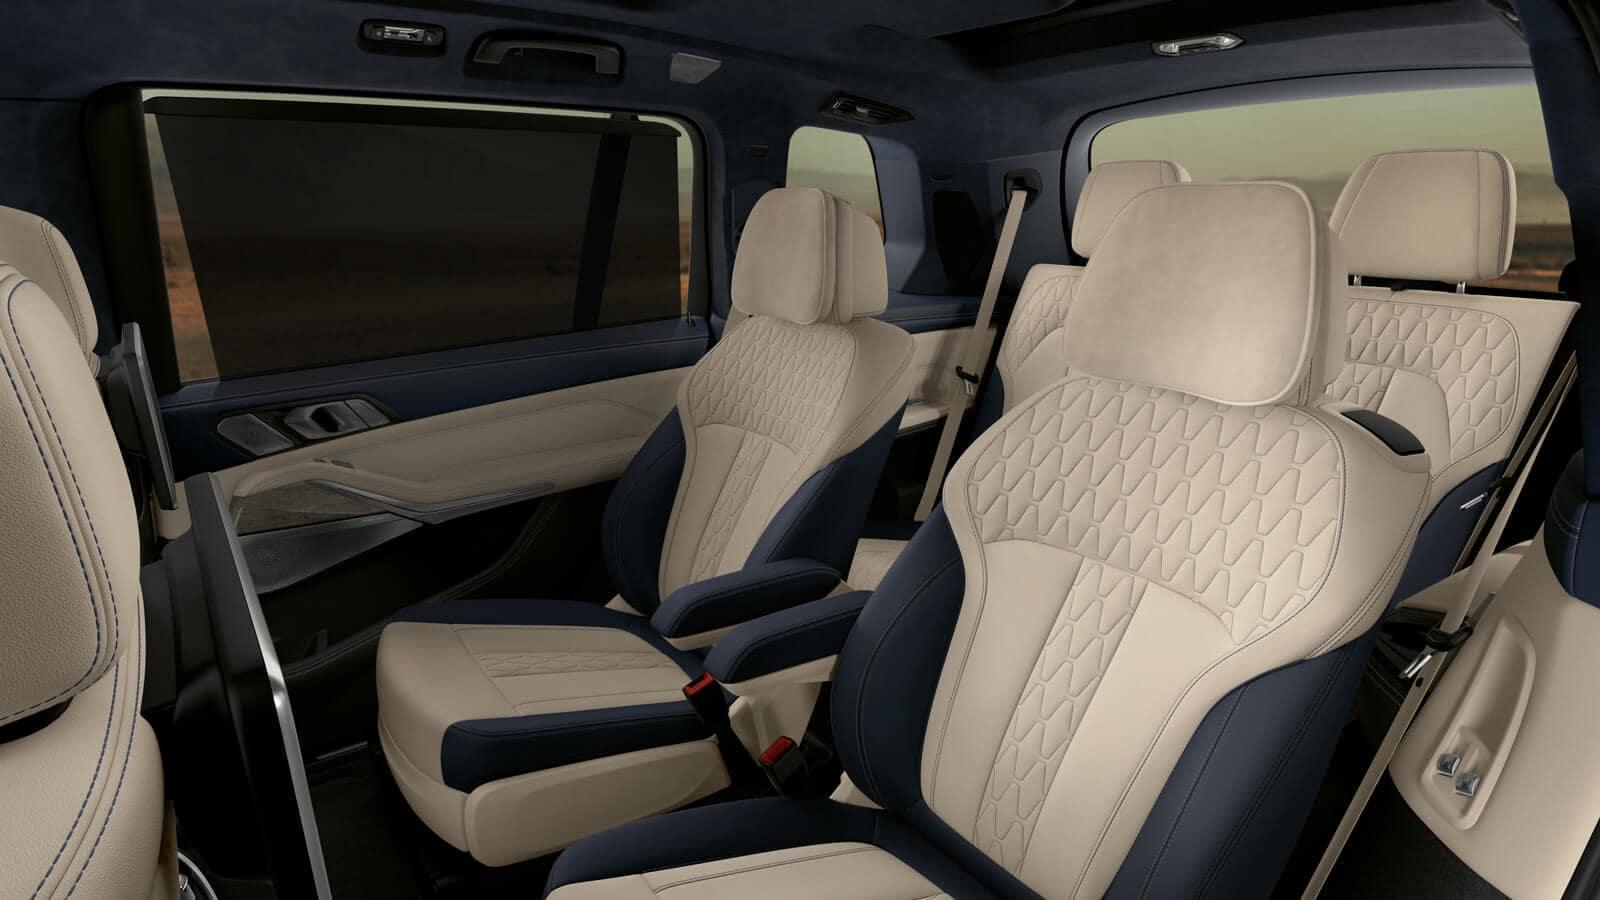 2019 BMW X7 seven seat configuration